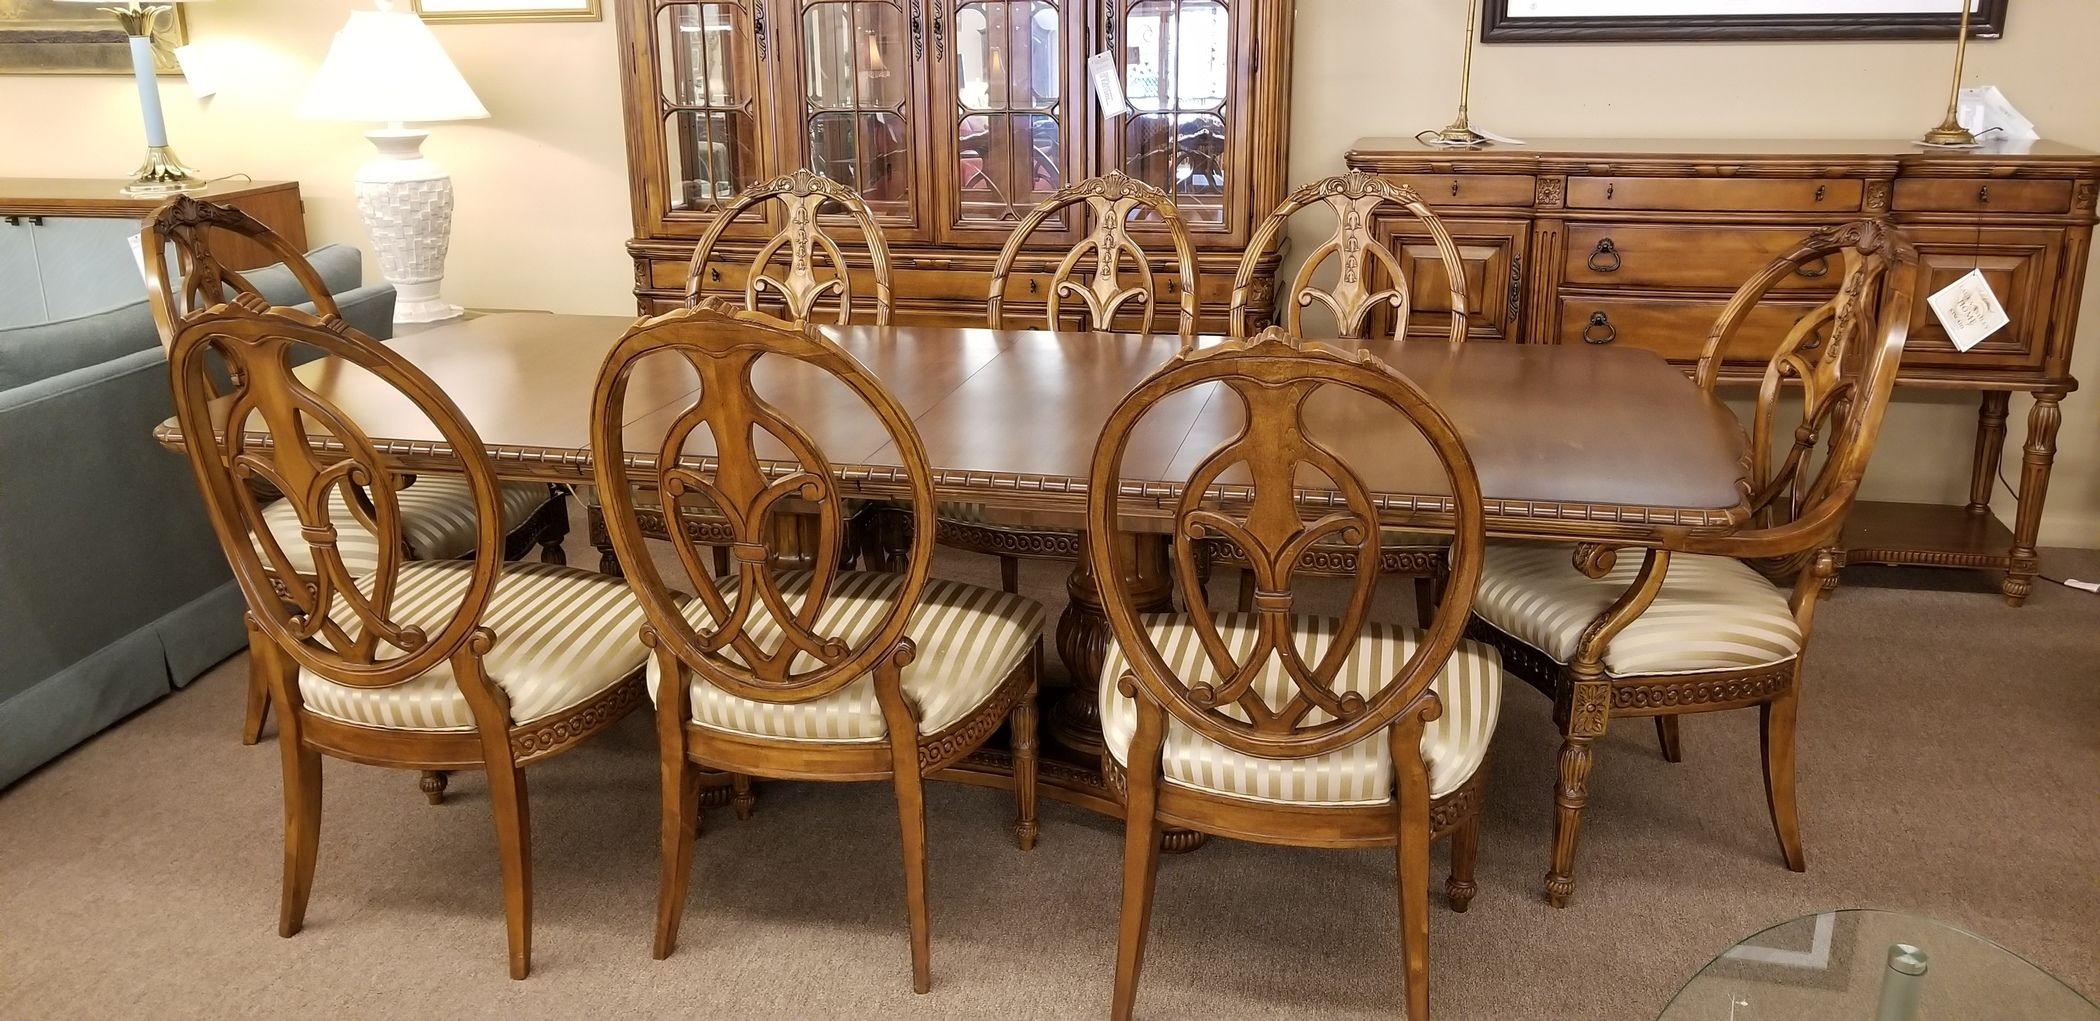 LAURA ASHLEY DINING ROOM SET   Delmarva Furniture Consignment